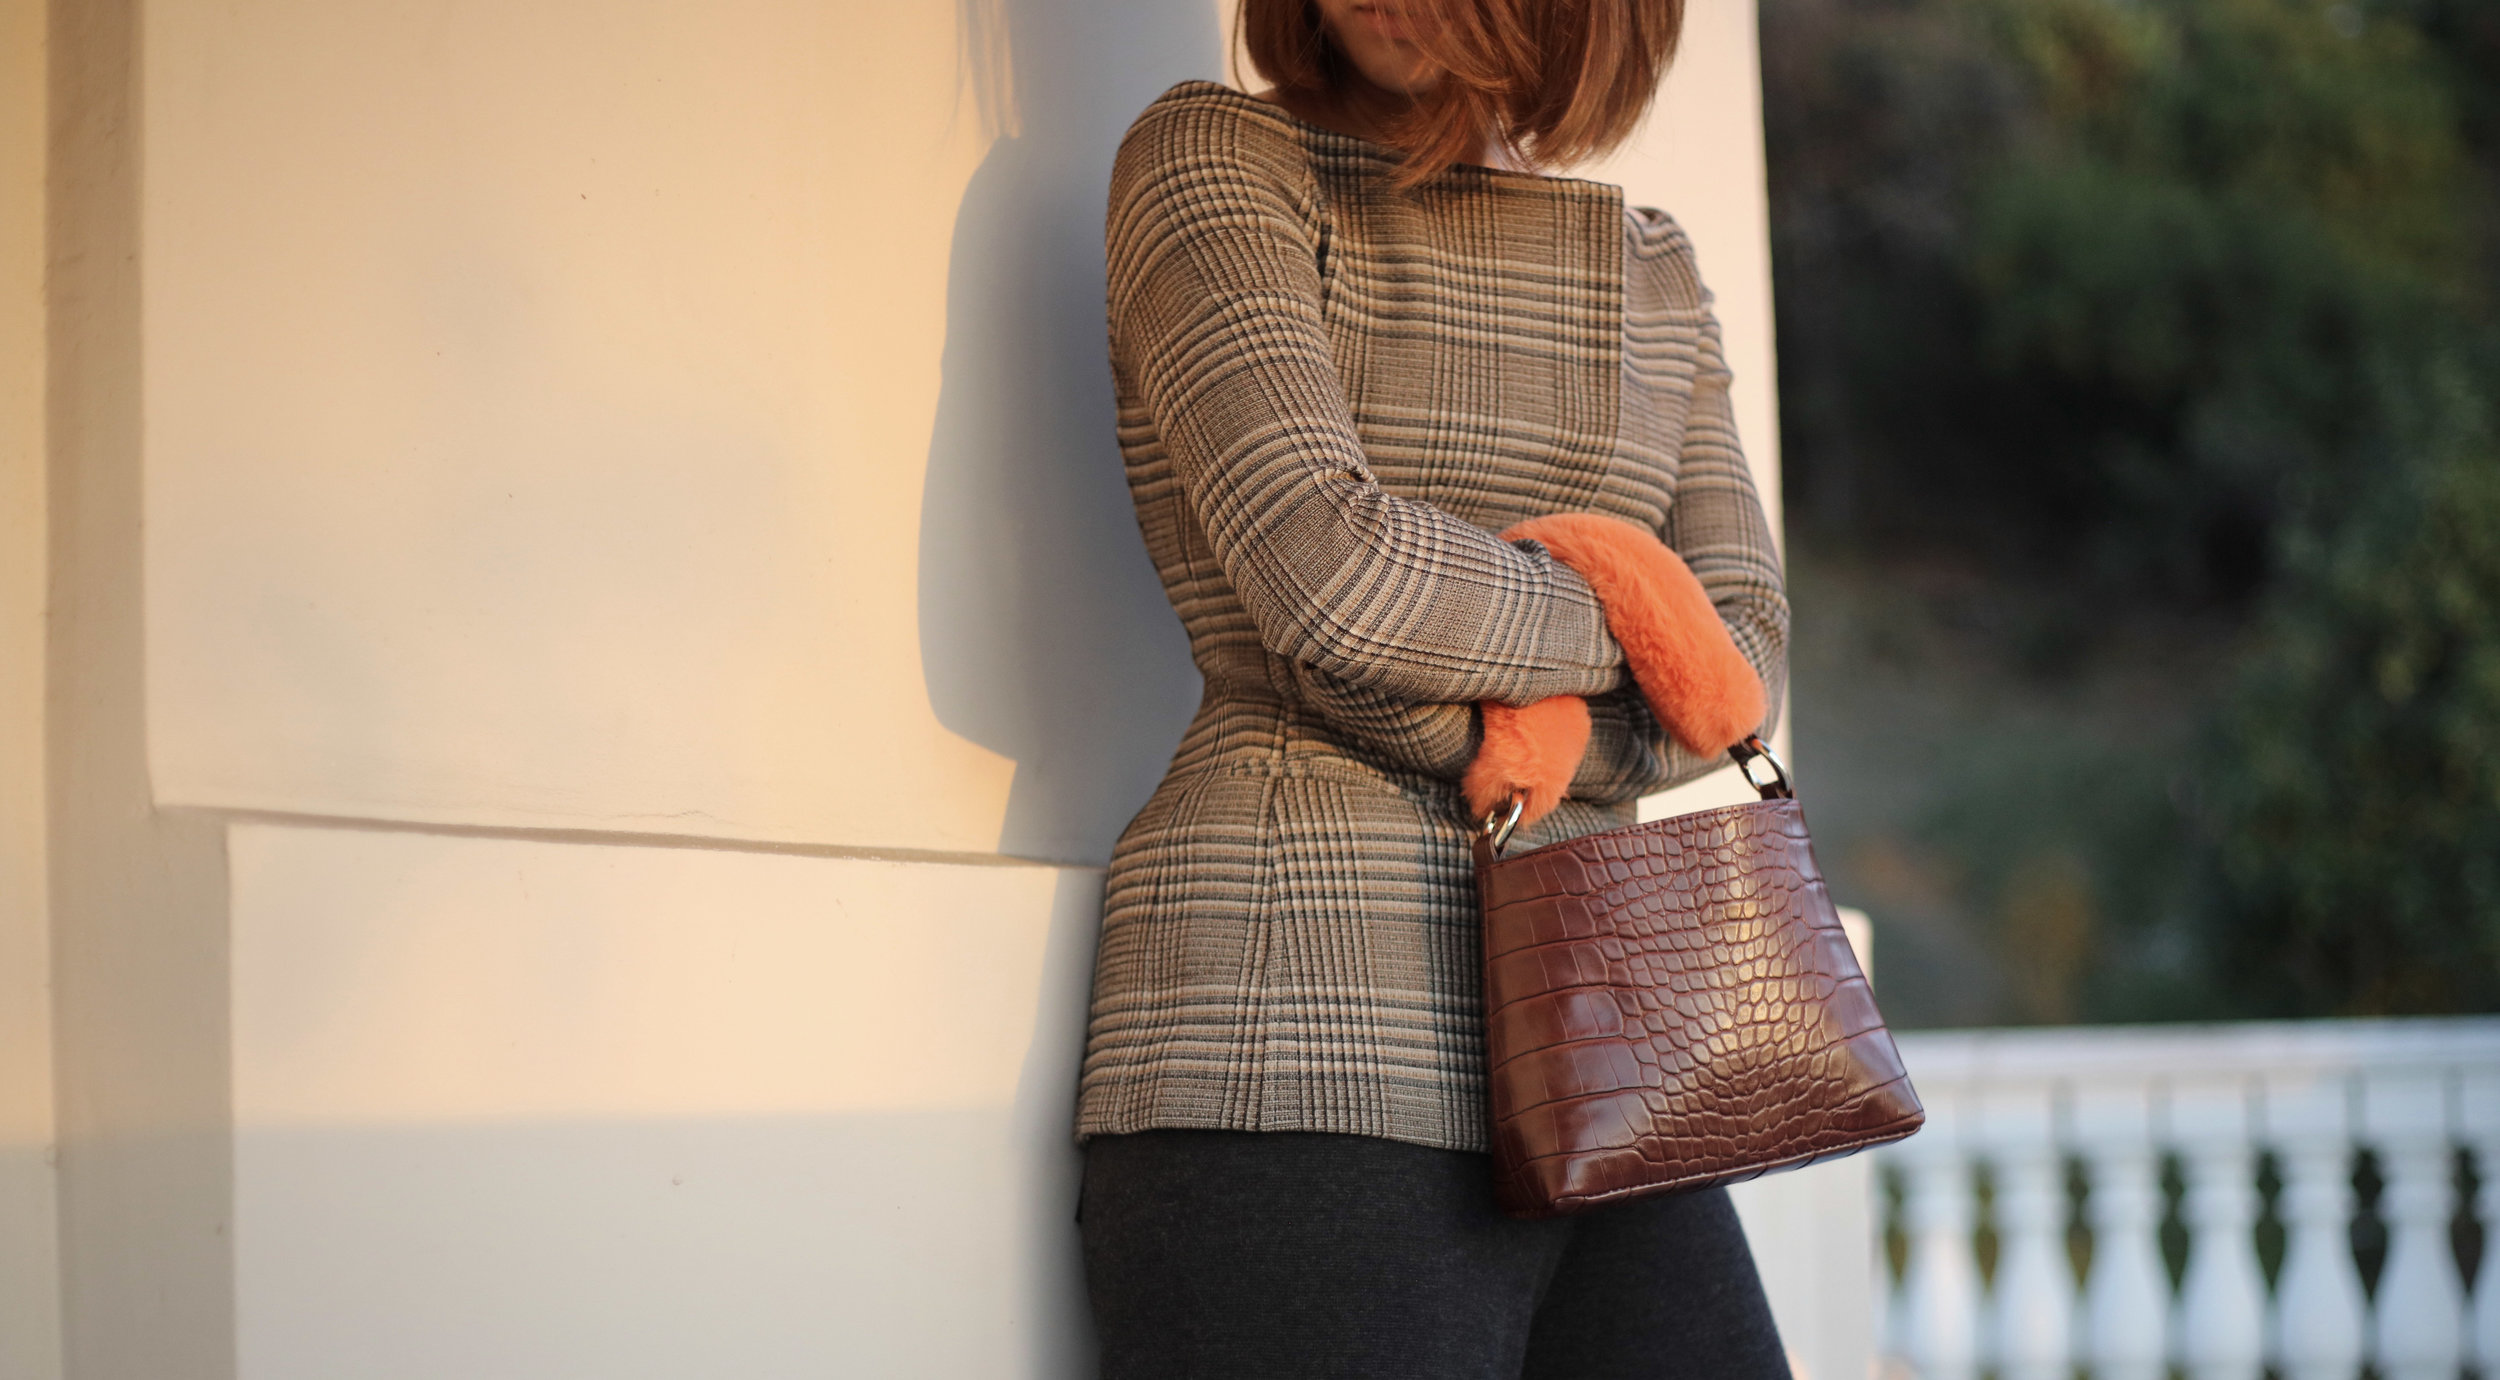 ms littlesbag croc handbag with fur.jpg